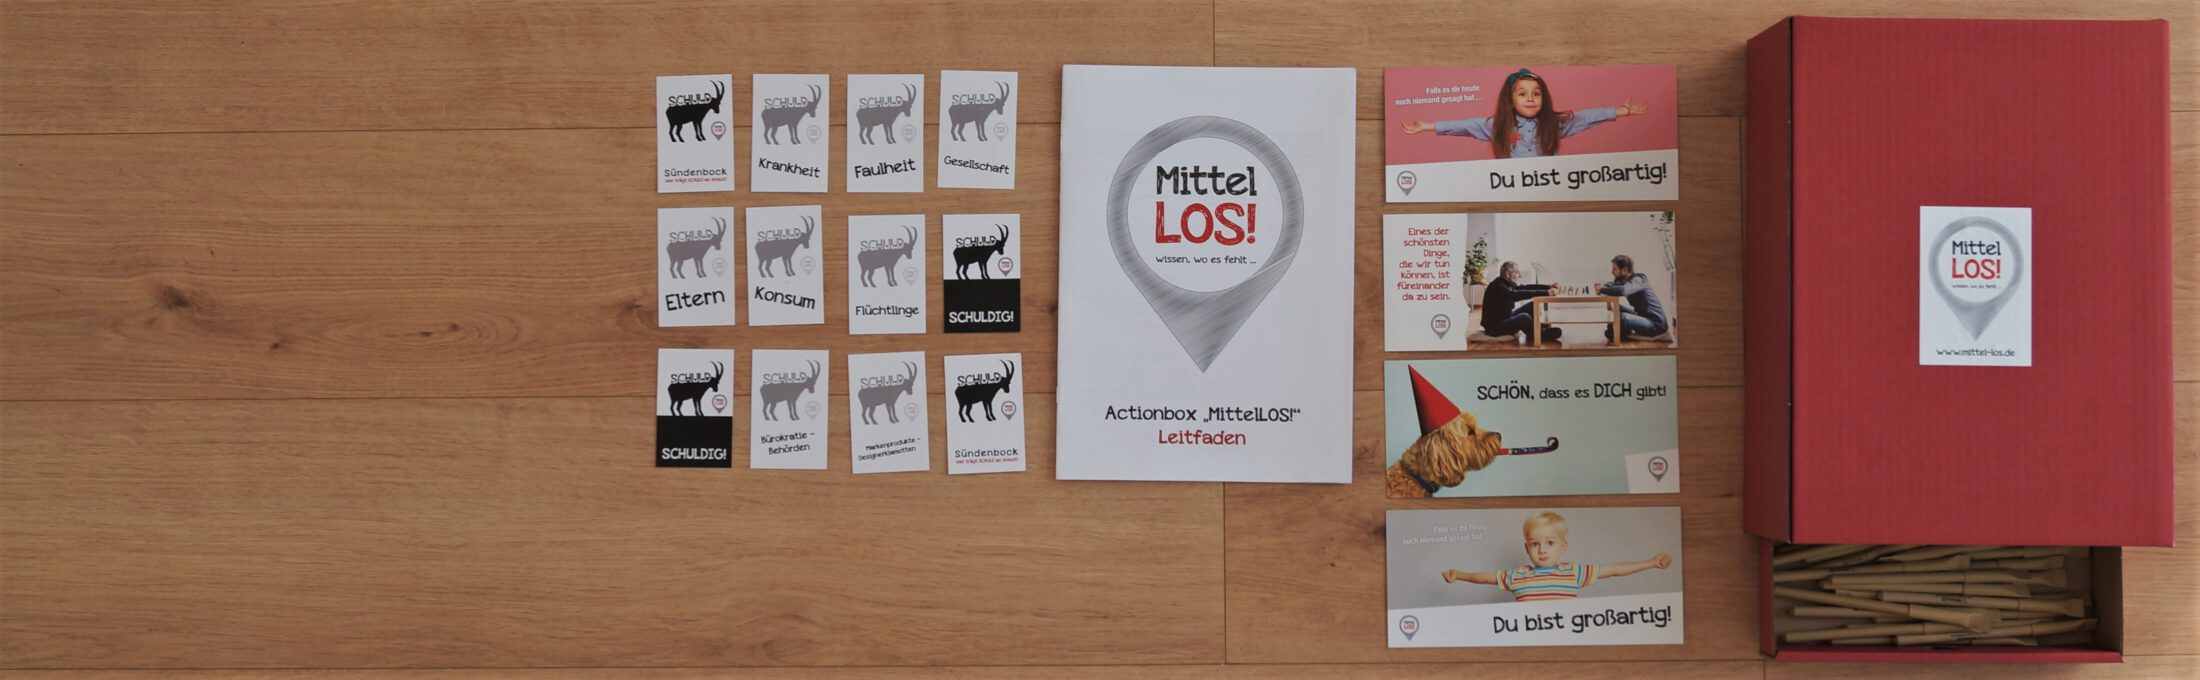 Actionbox MittelLOS!